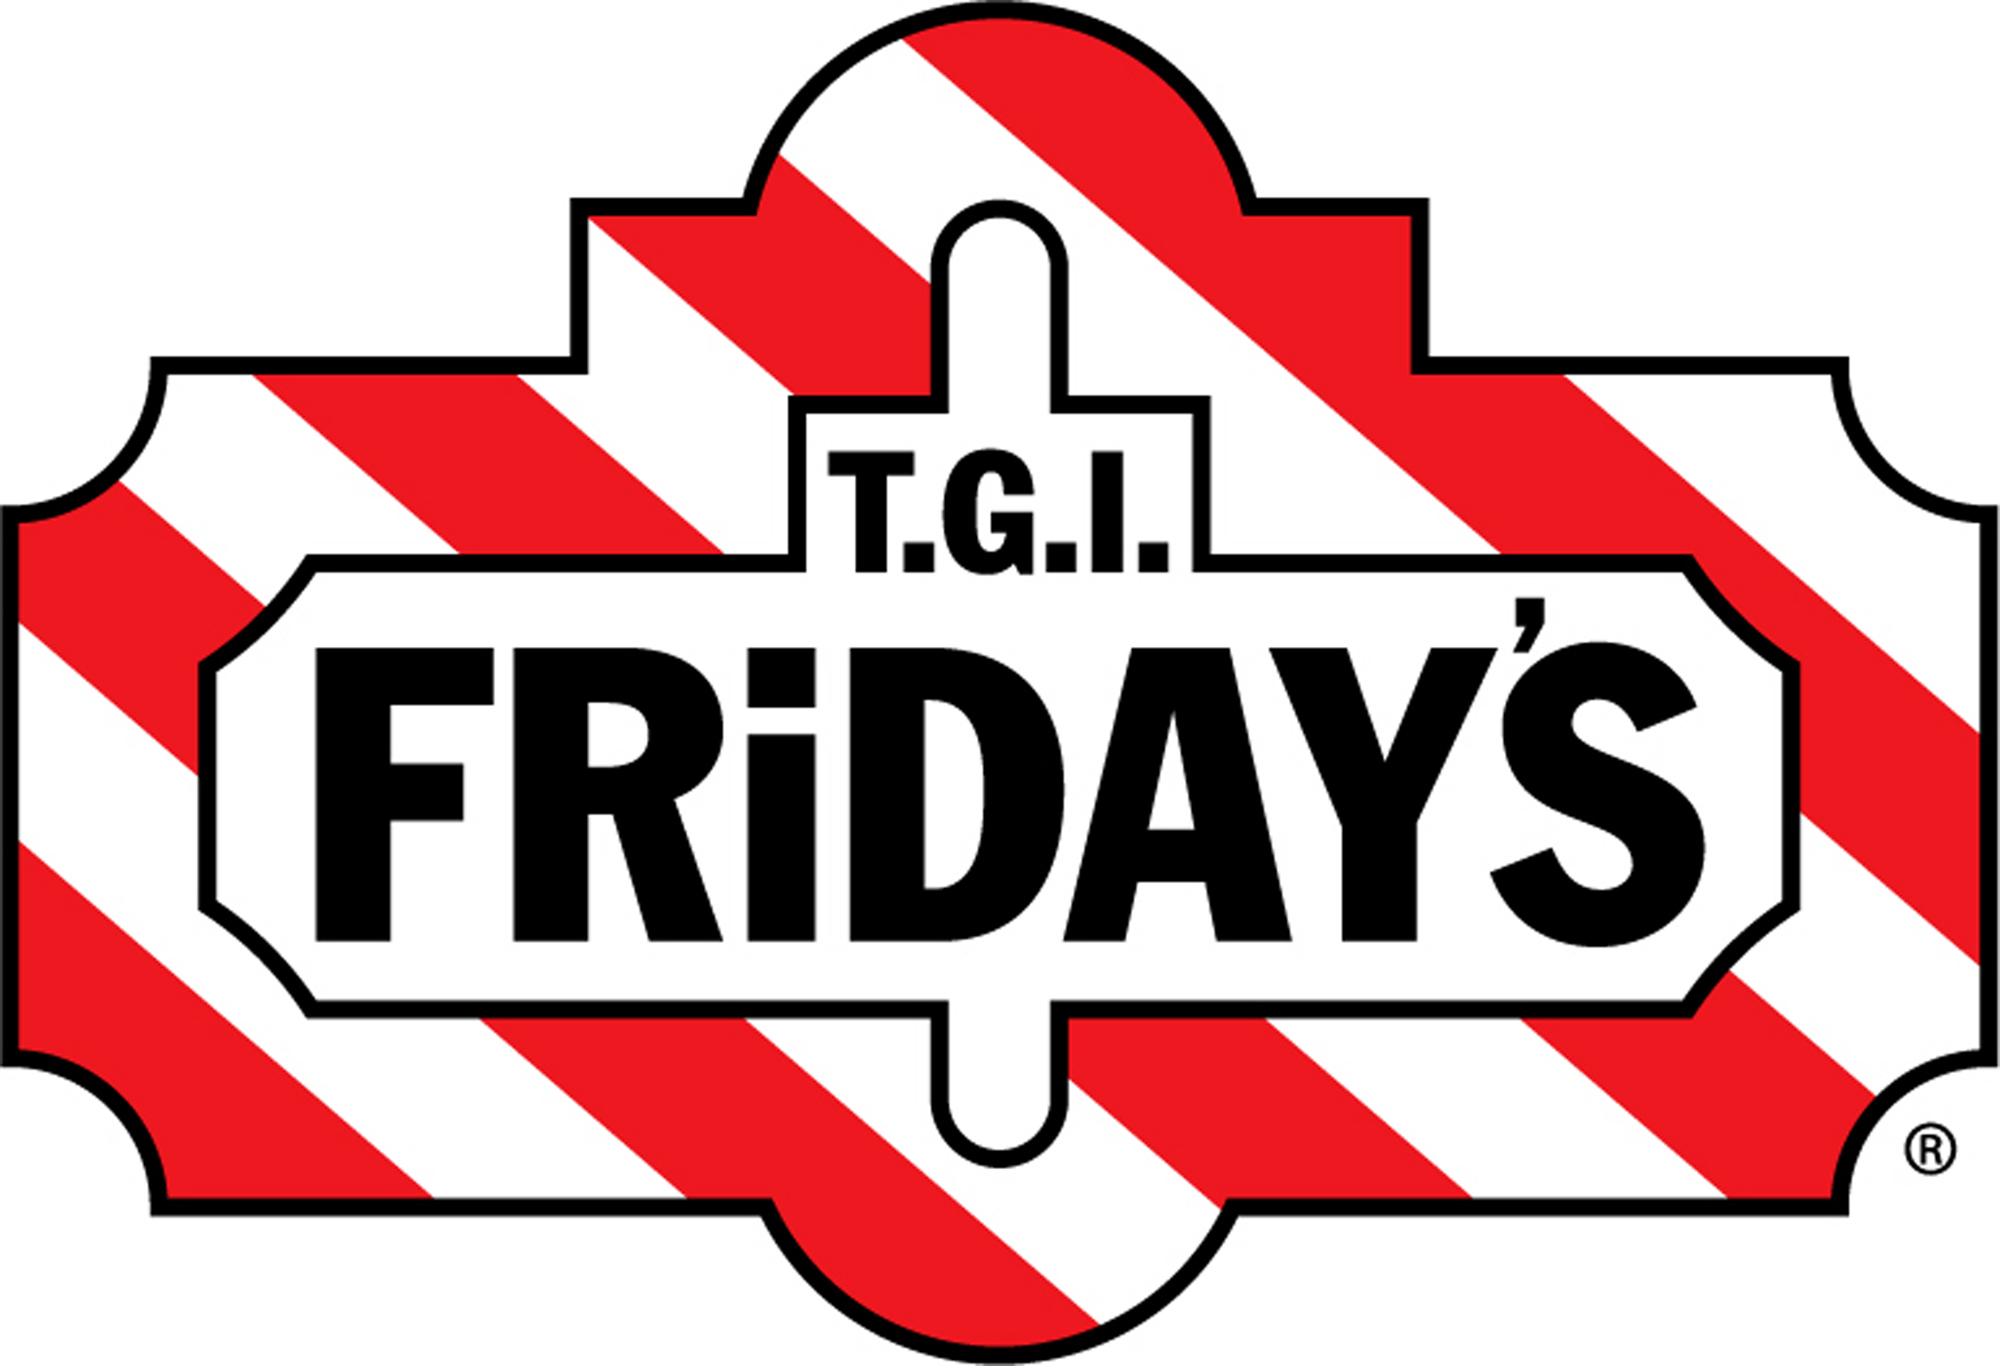 Old TGI Fridays Logo.jpg